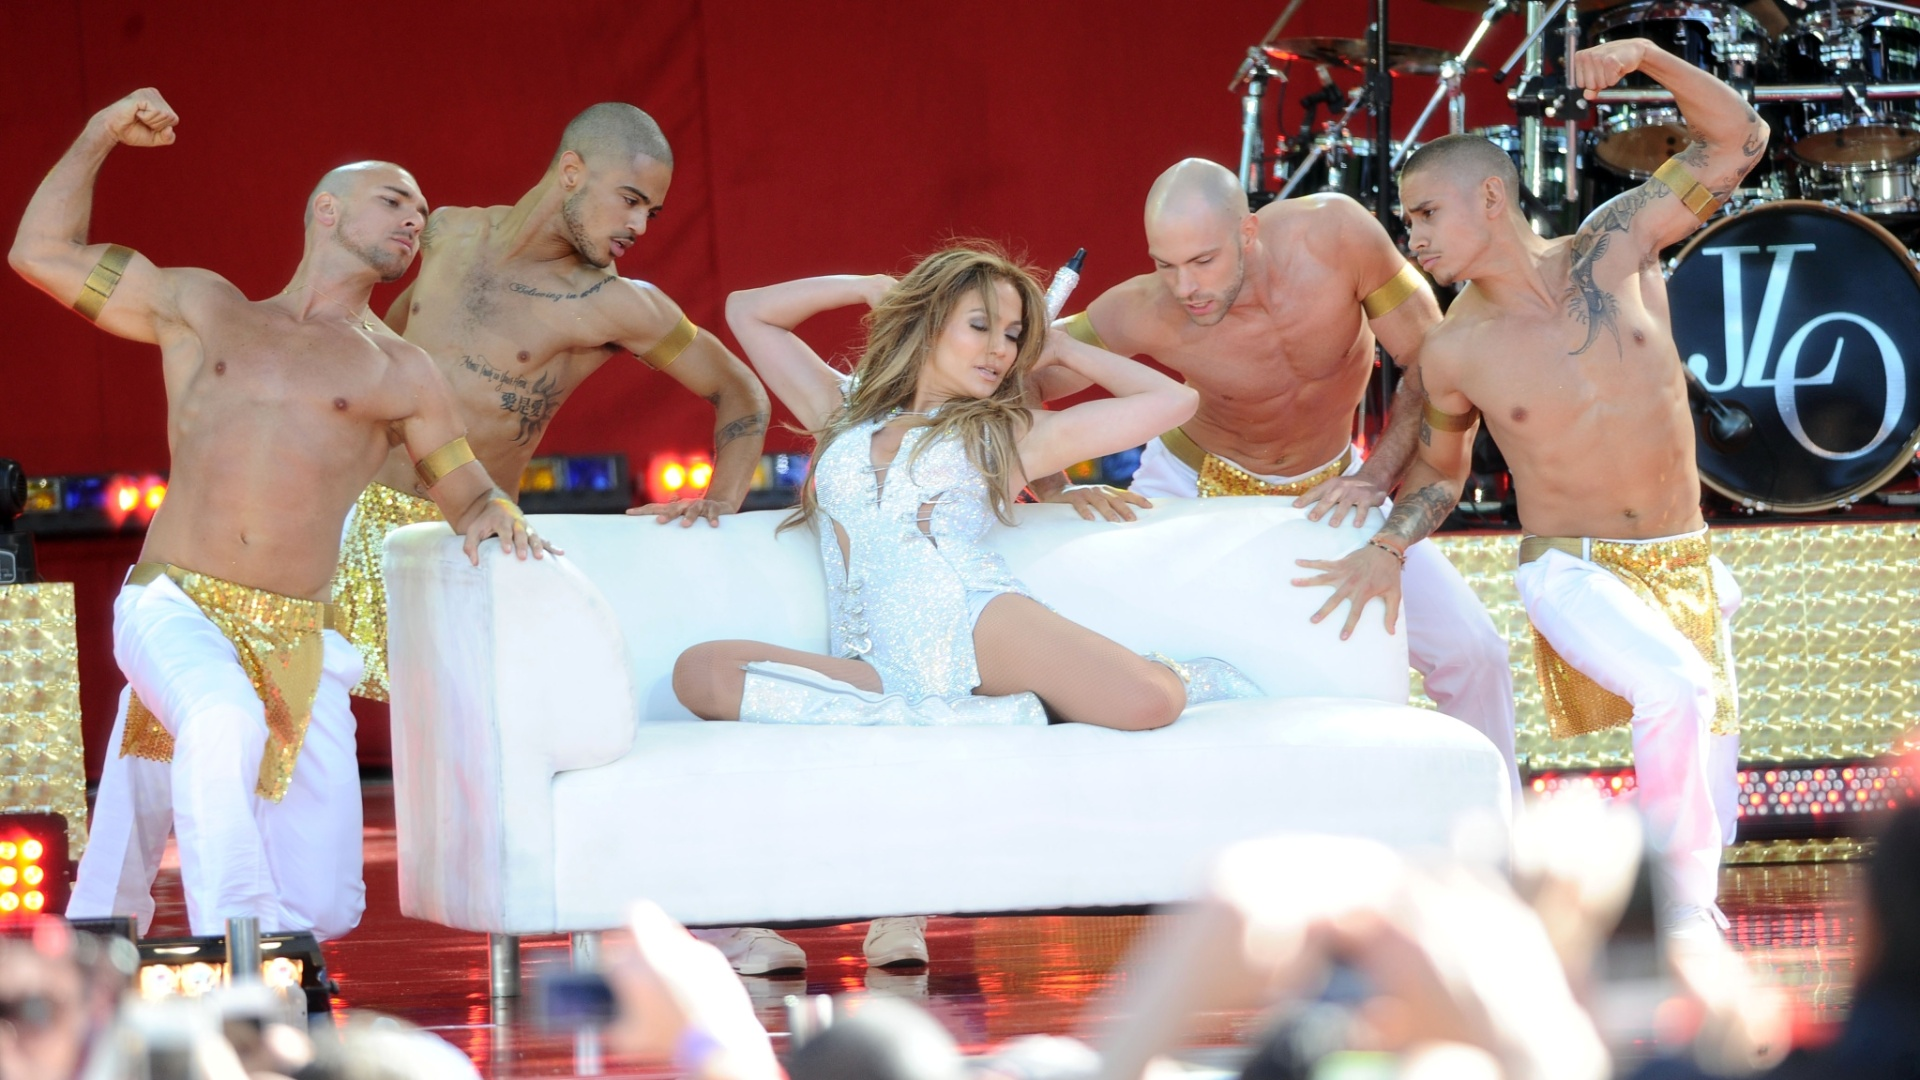 20.jun.2014 - Jennifer Lopez se apresenta no Central Park, em Nova York